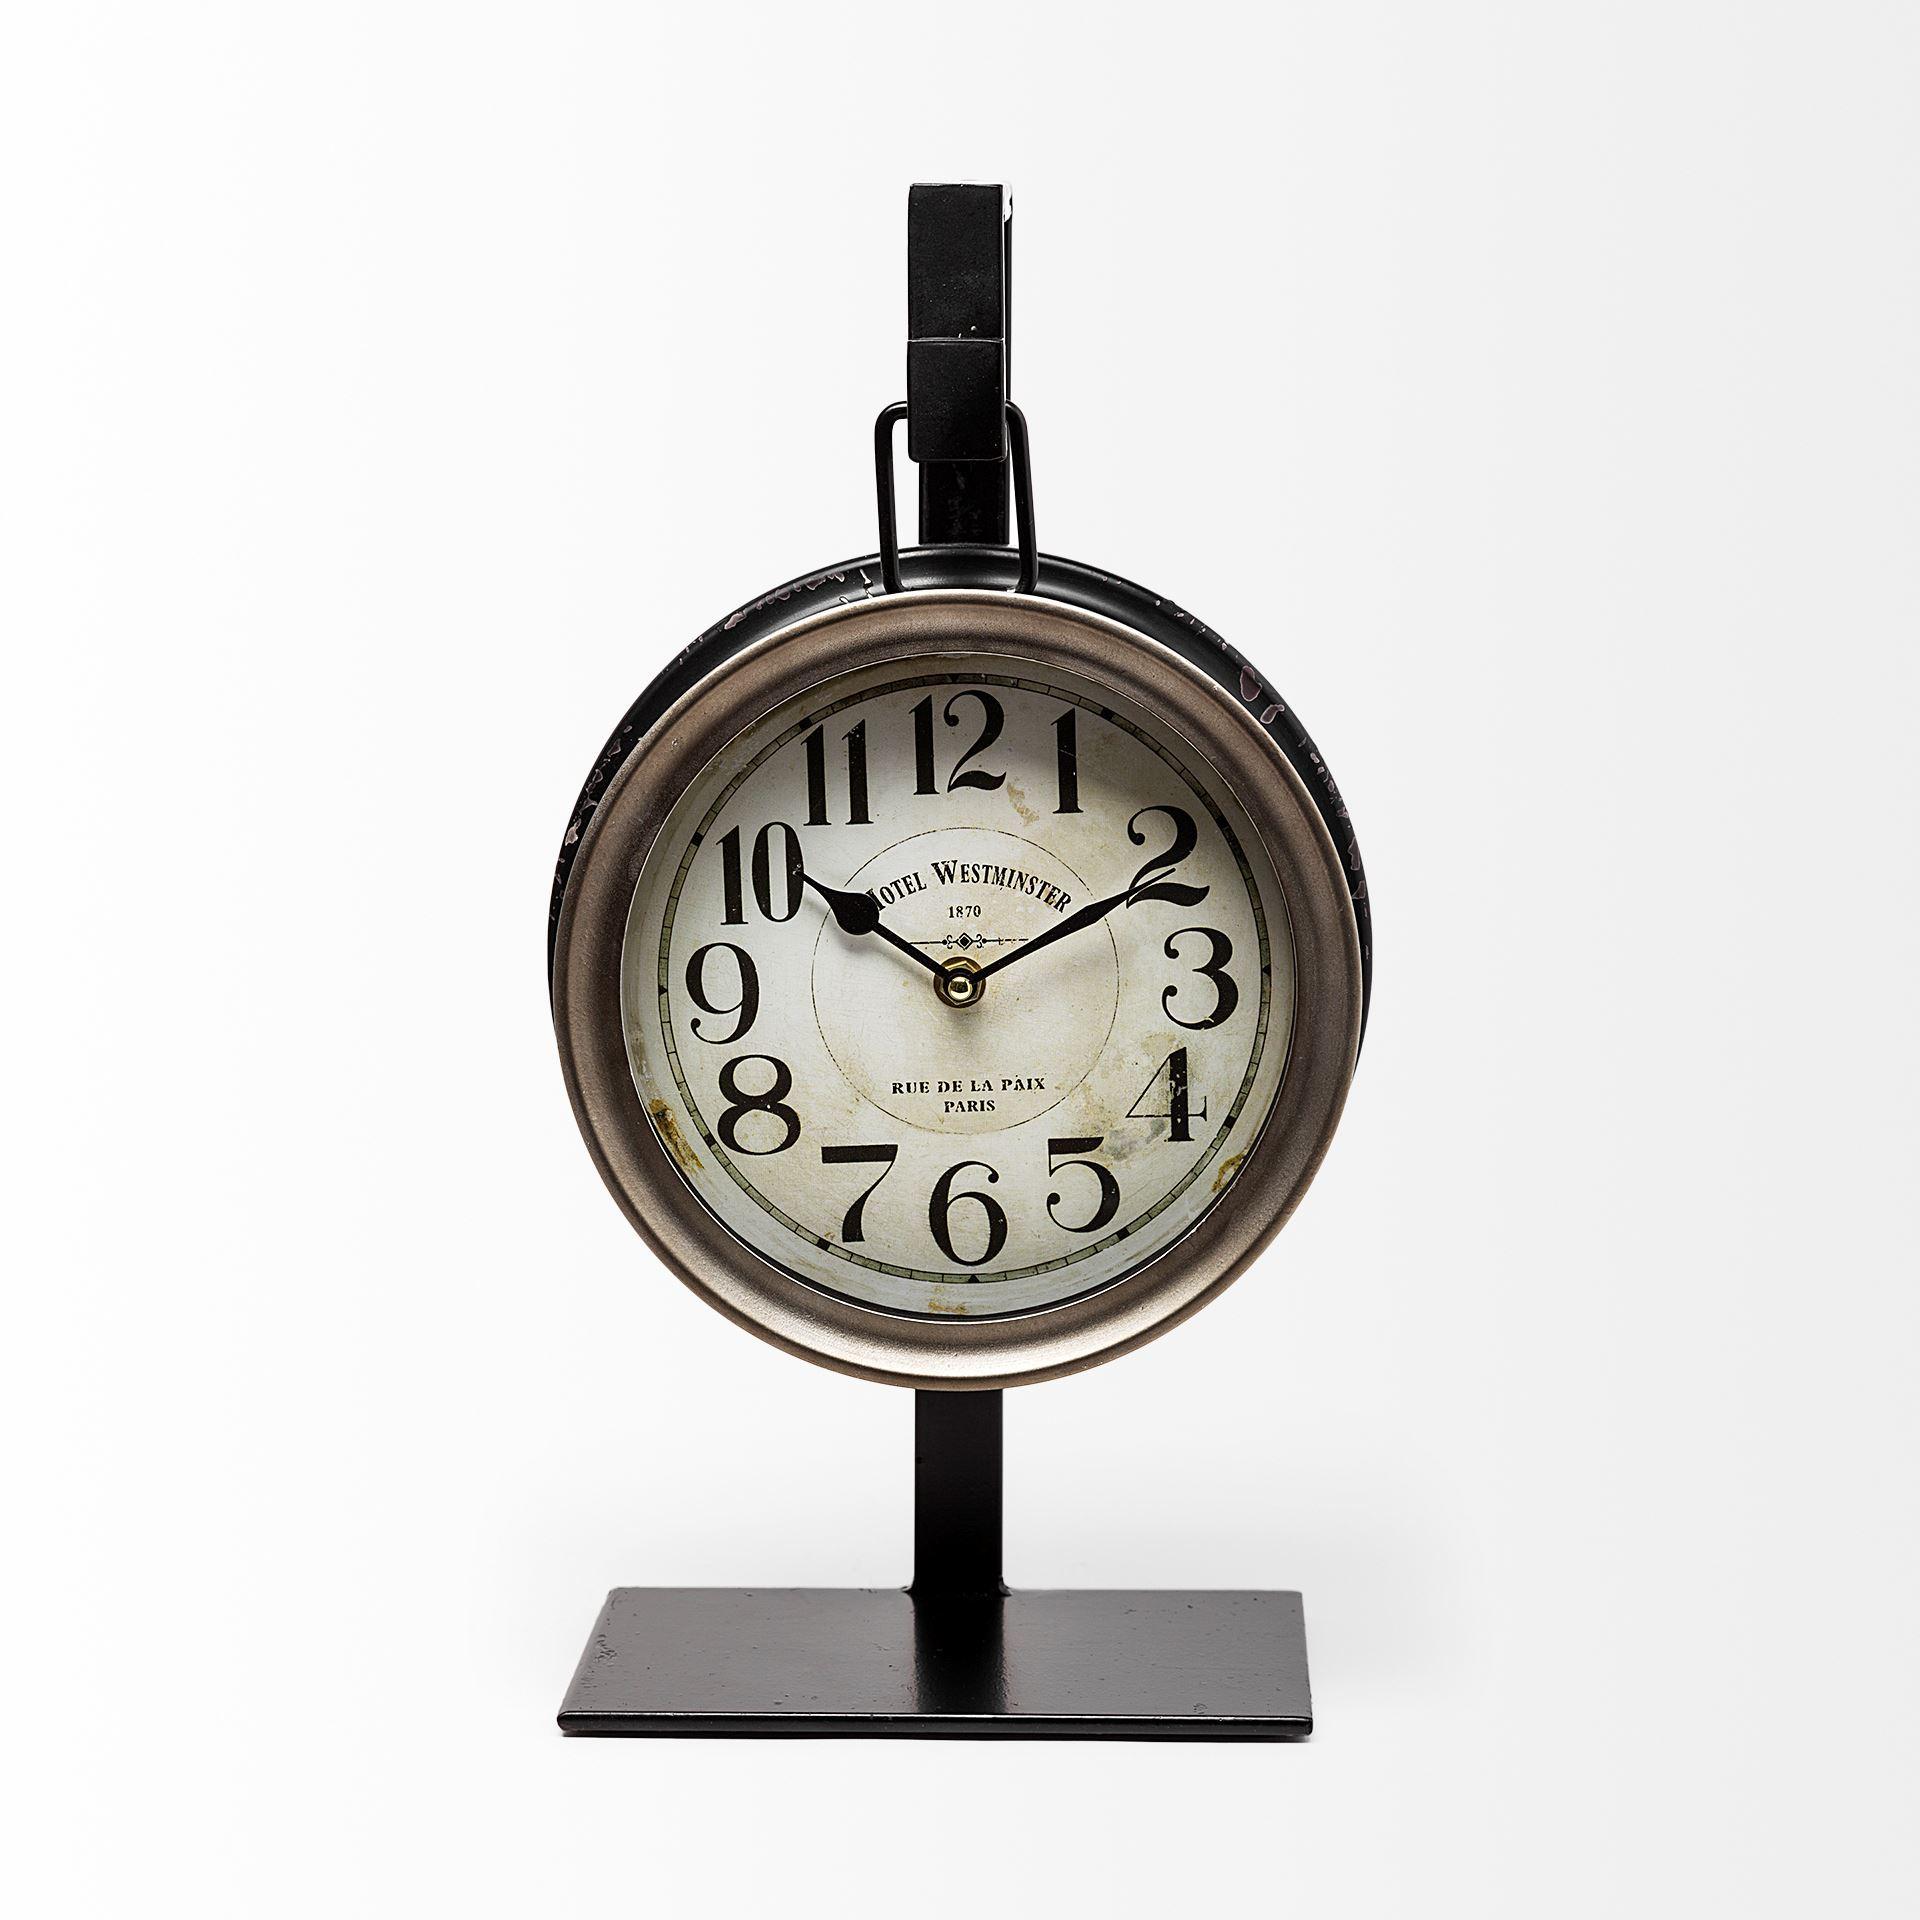 Metallic Brown Metal Hanging Desk/Table Clock